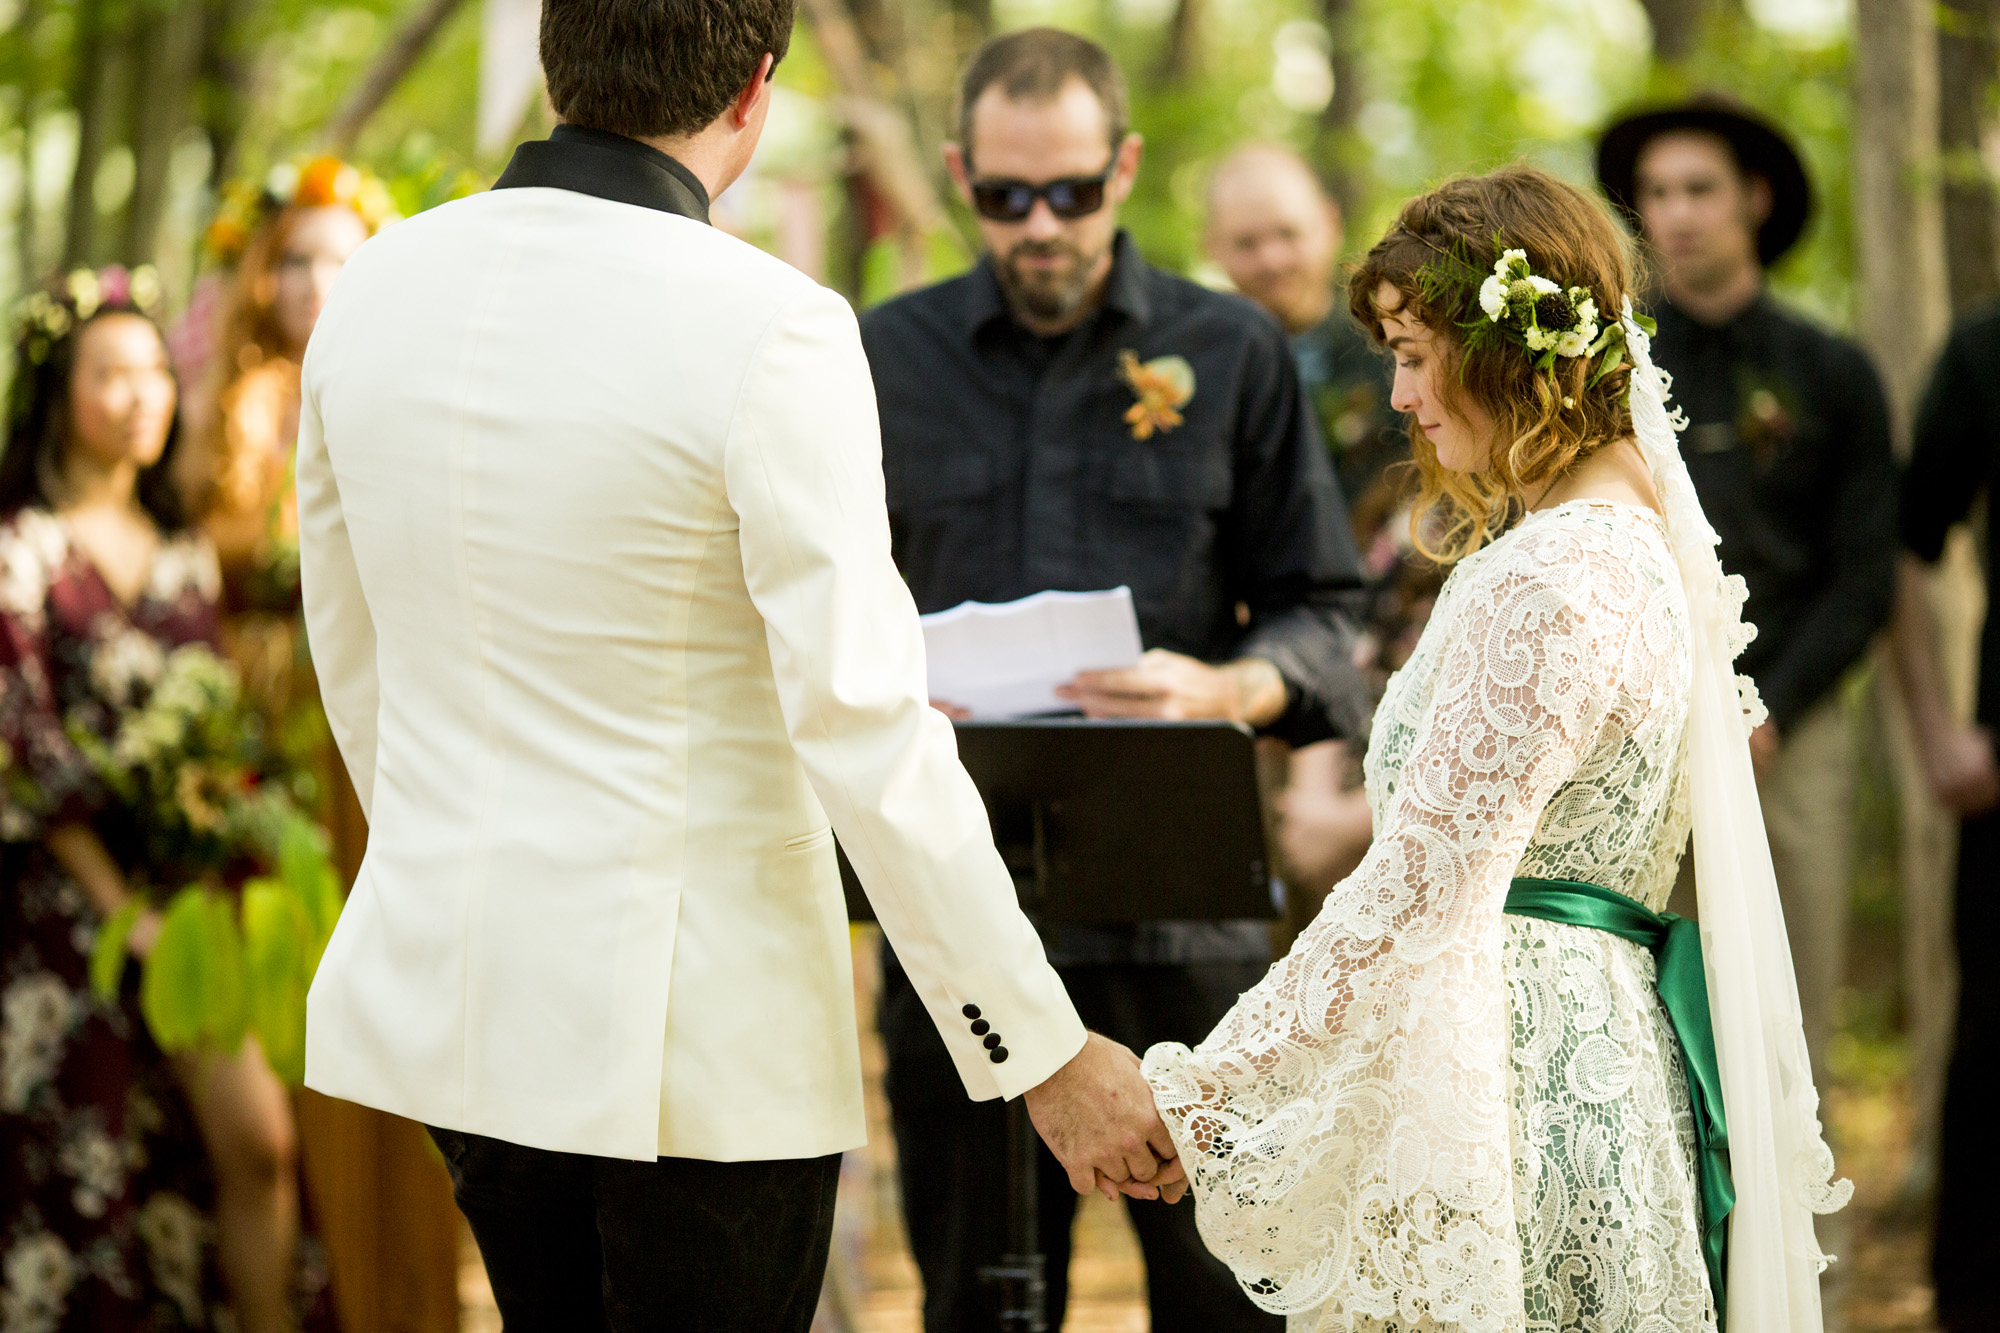 Seriously_Sabrina_Photography_Red_River_Gorge_Kentucky_Wedding_ShawnDana118.jpg